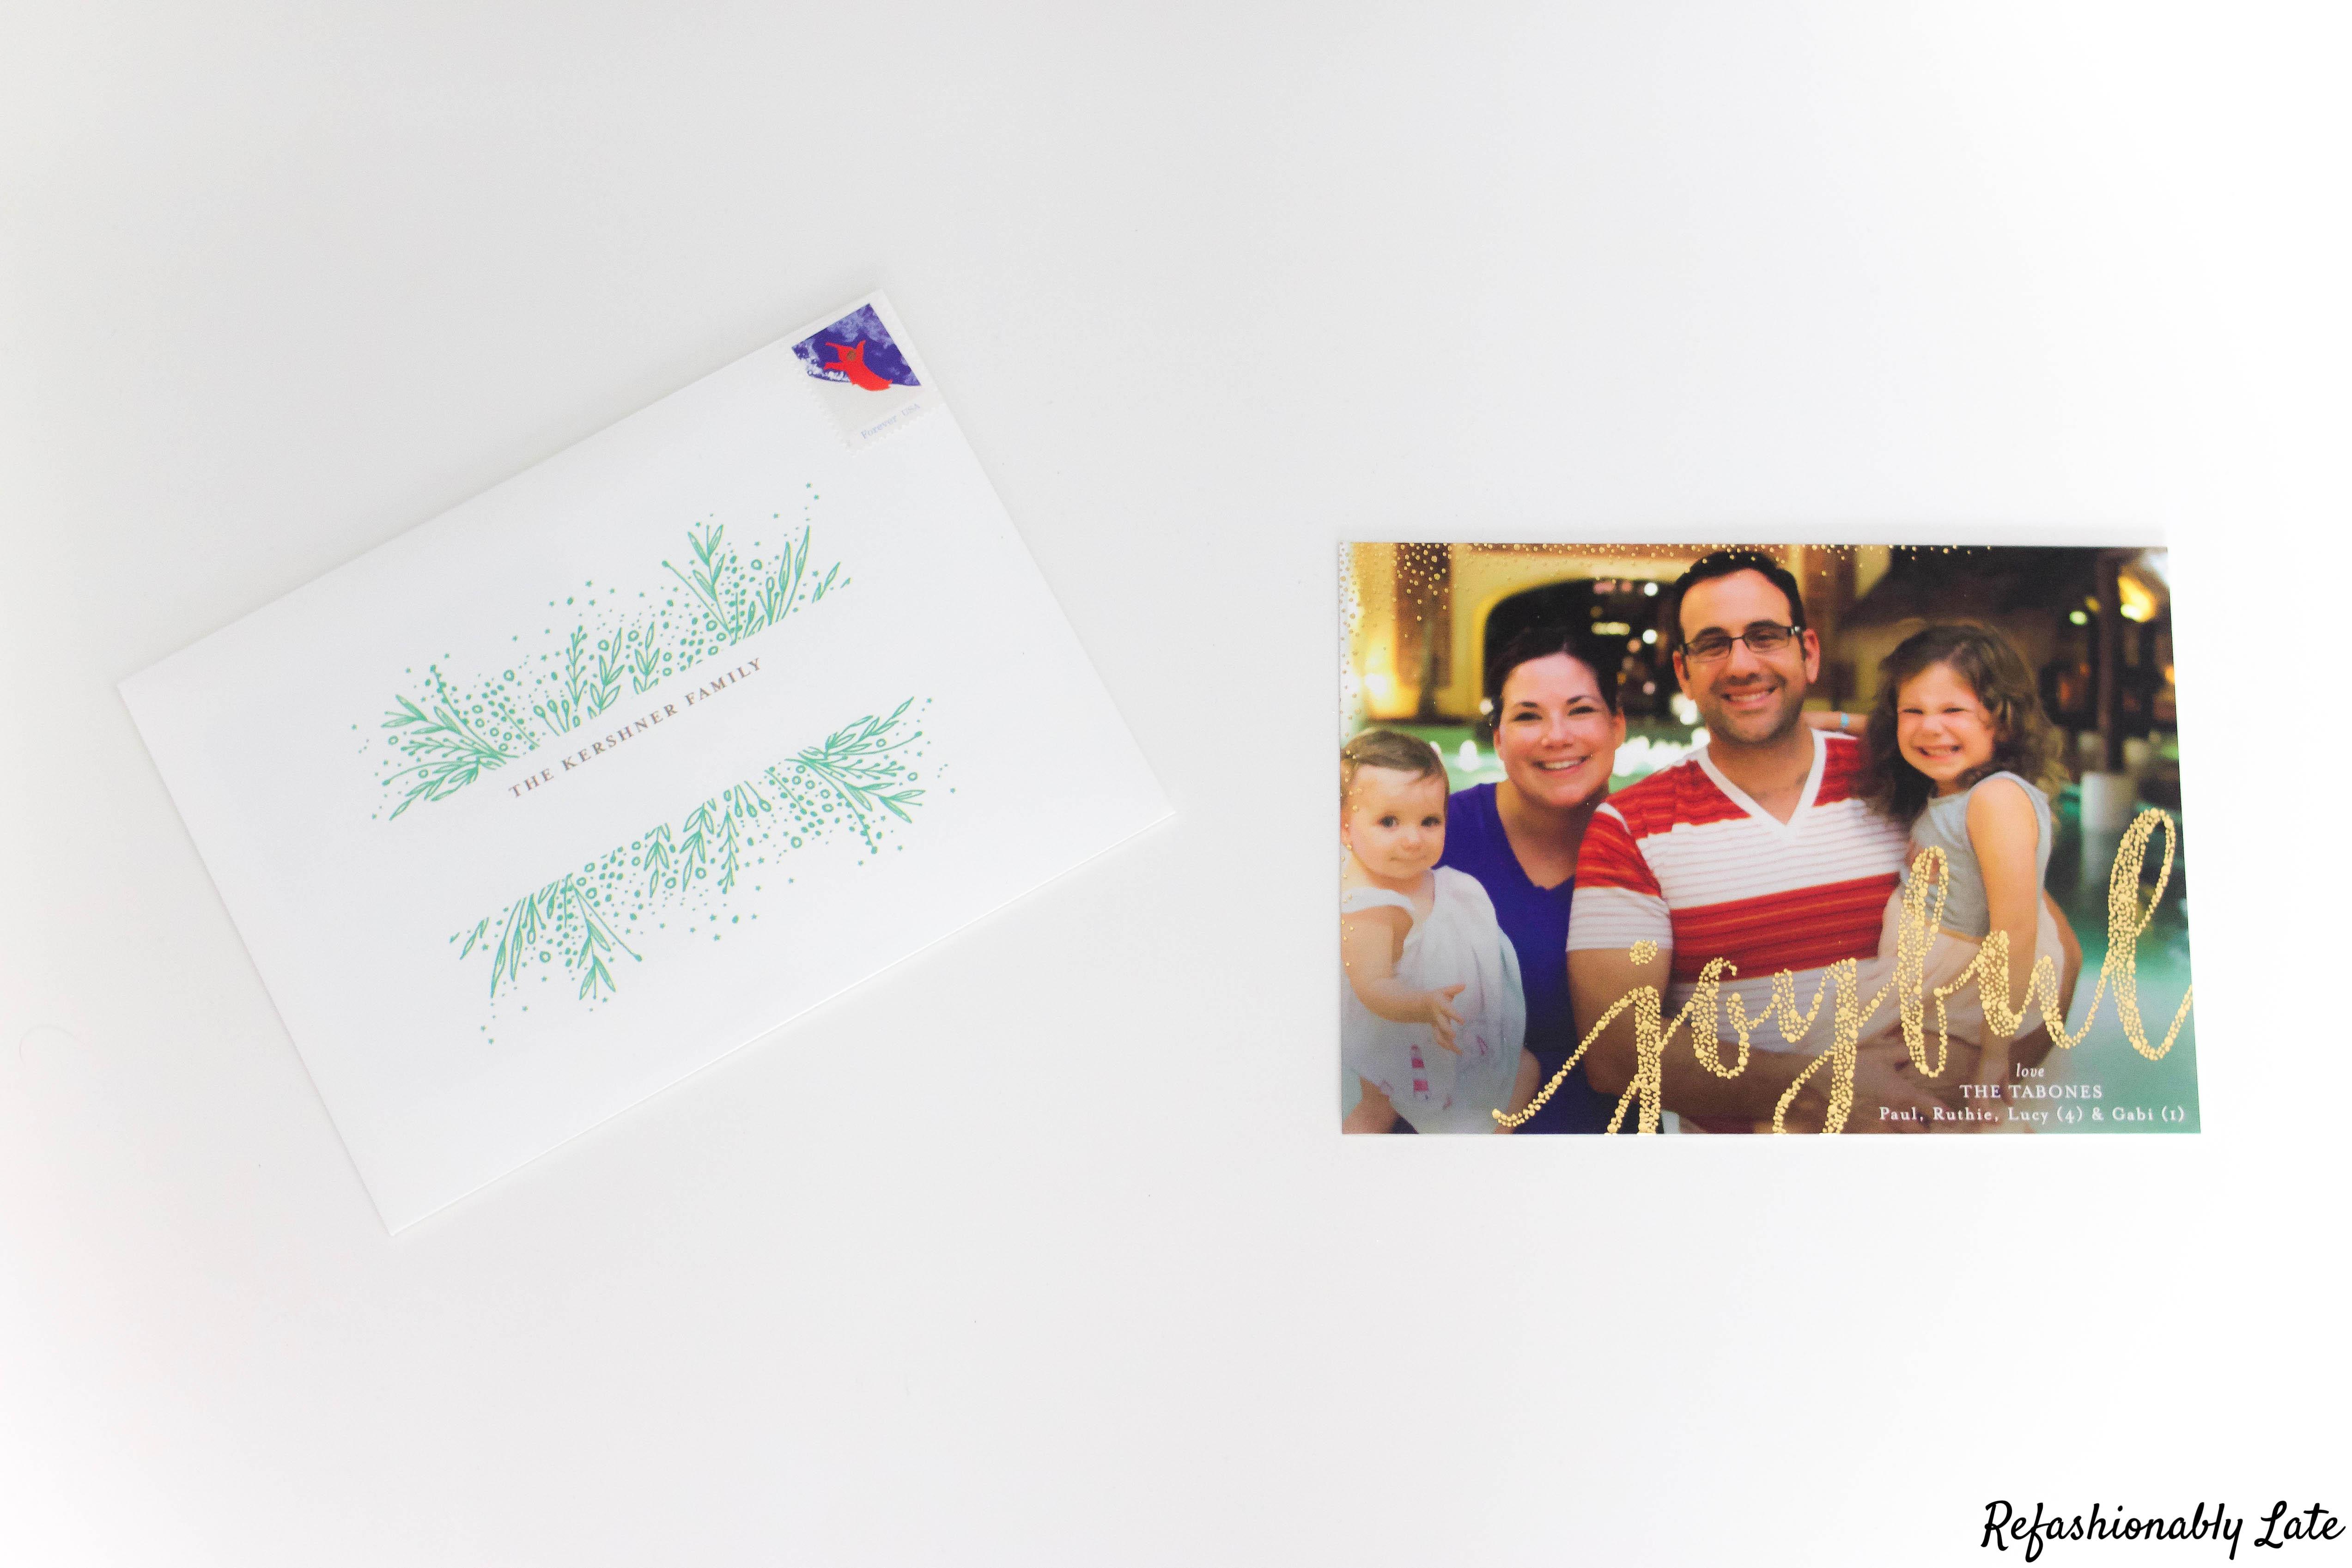 Happy Holidays from the Tabones - www.refashionablylate.com